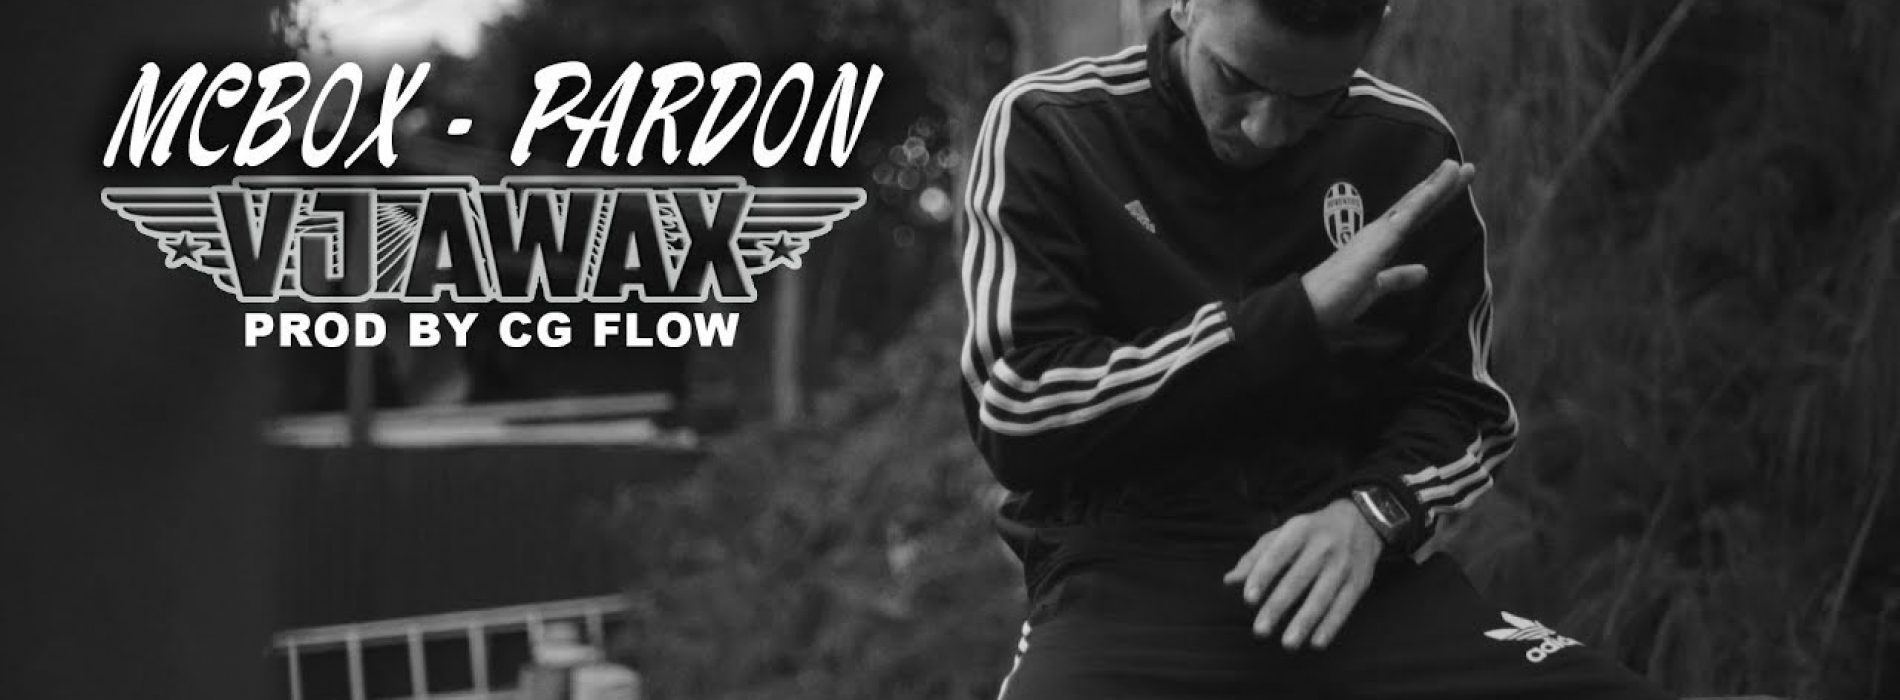 VJ AWAX FT MCBOX – Pardon (Real Story Part 3) – Septembre 2017